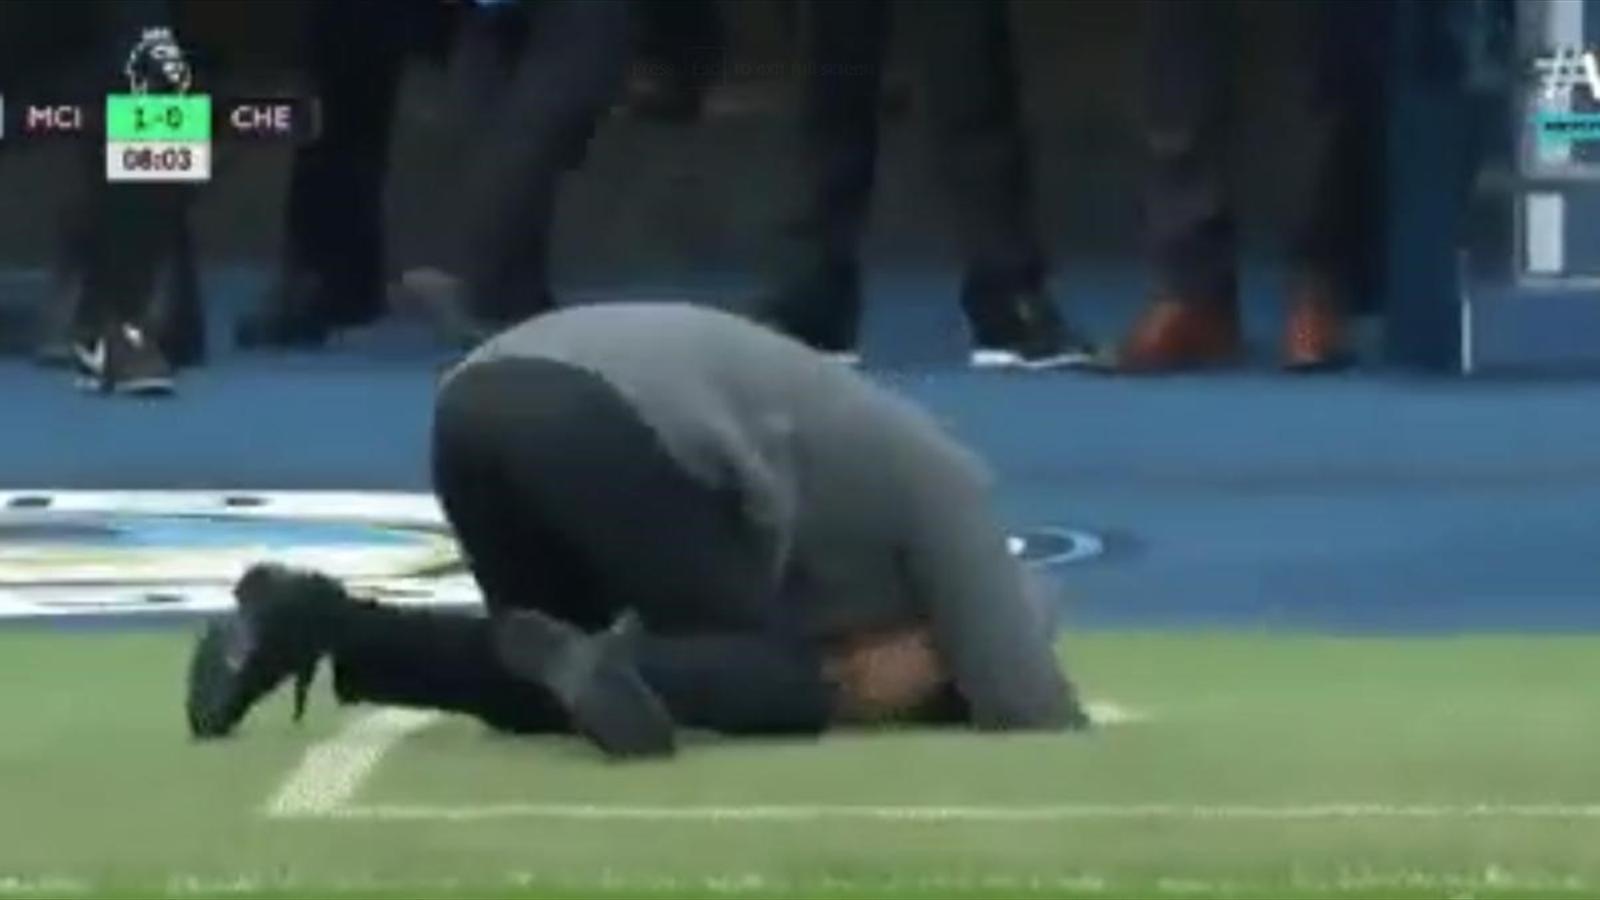 Хосеп Гвардиола едва не забился в конвульсиях после жуткого промаха Серхио Агуэро